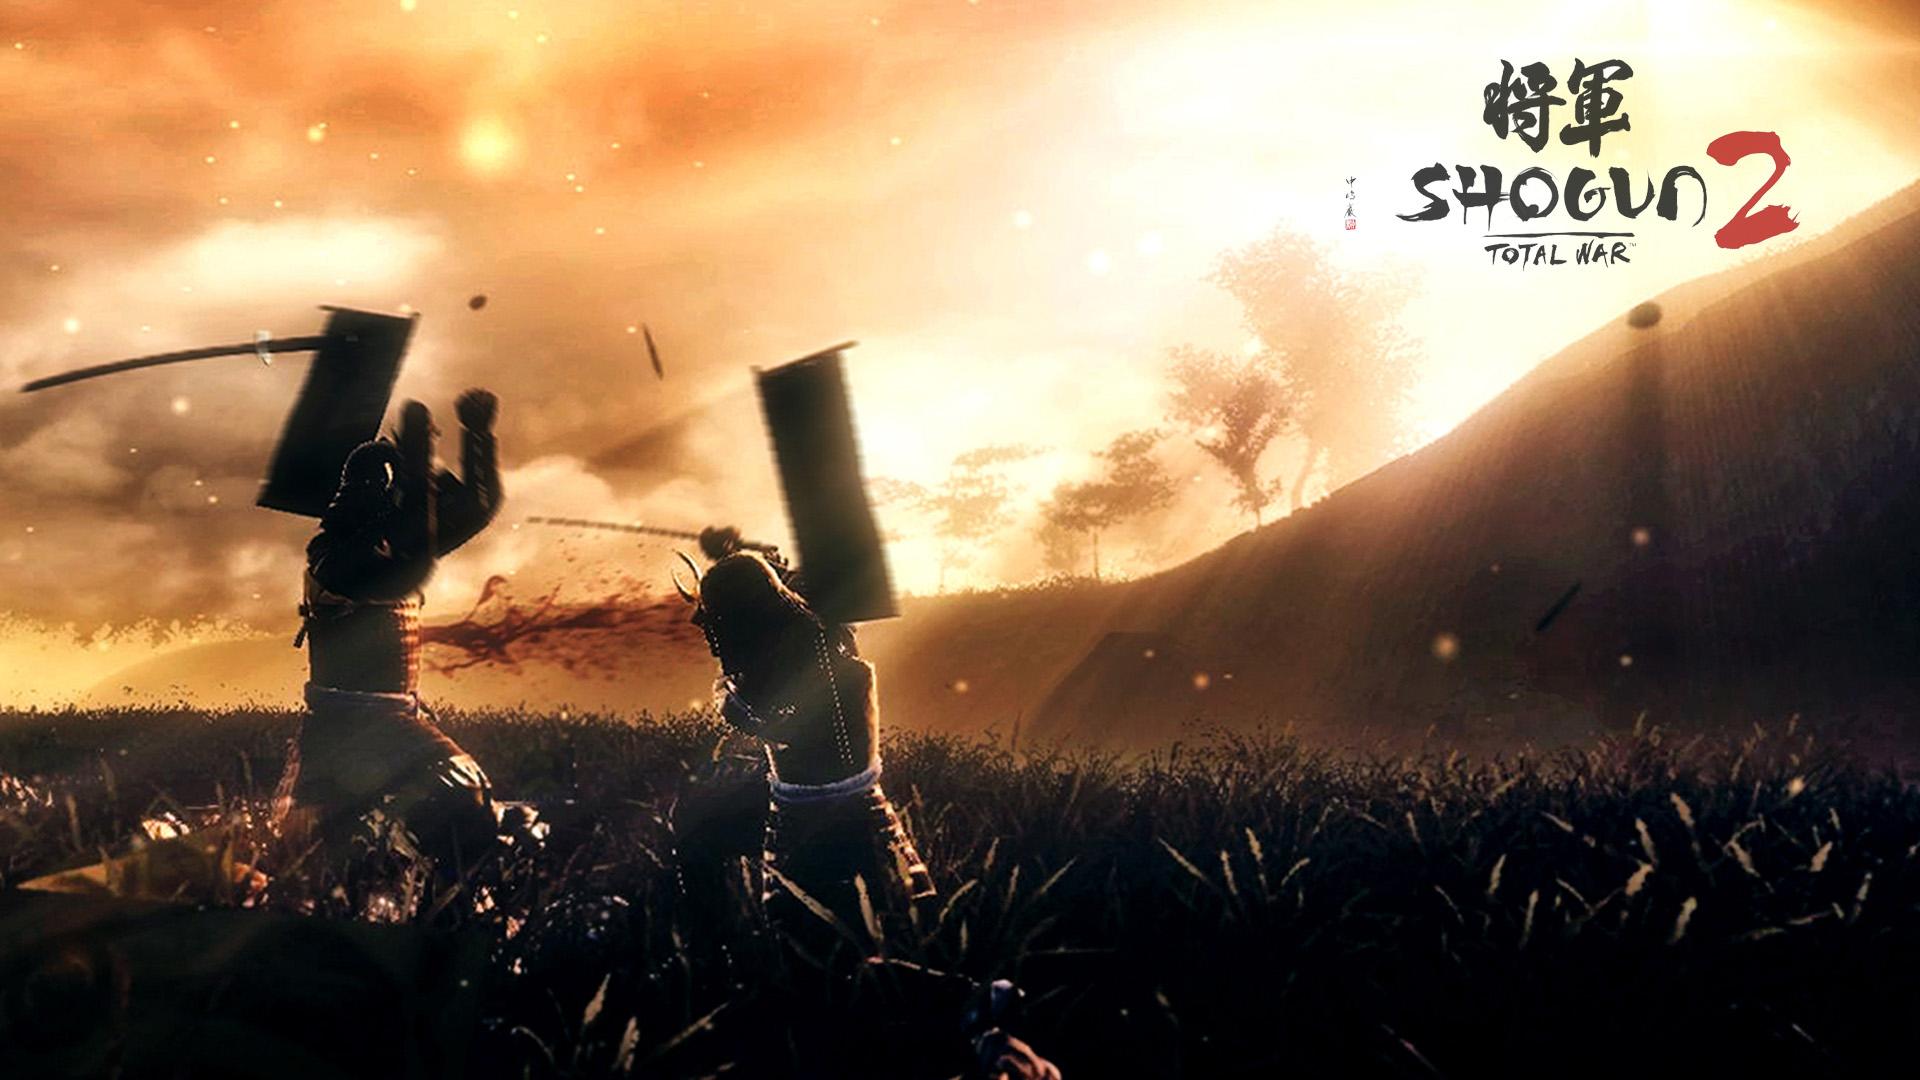 Total War Shogun 2 Fall Of The Samurai Wallpaper Hd Steam Workshop Shogun Total War 2